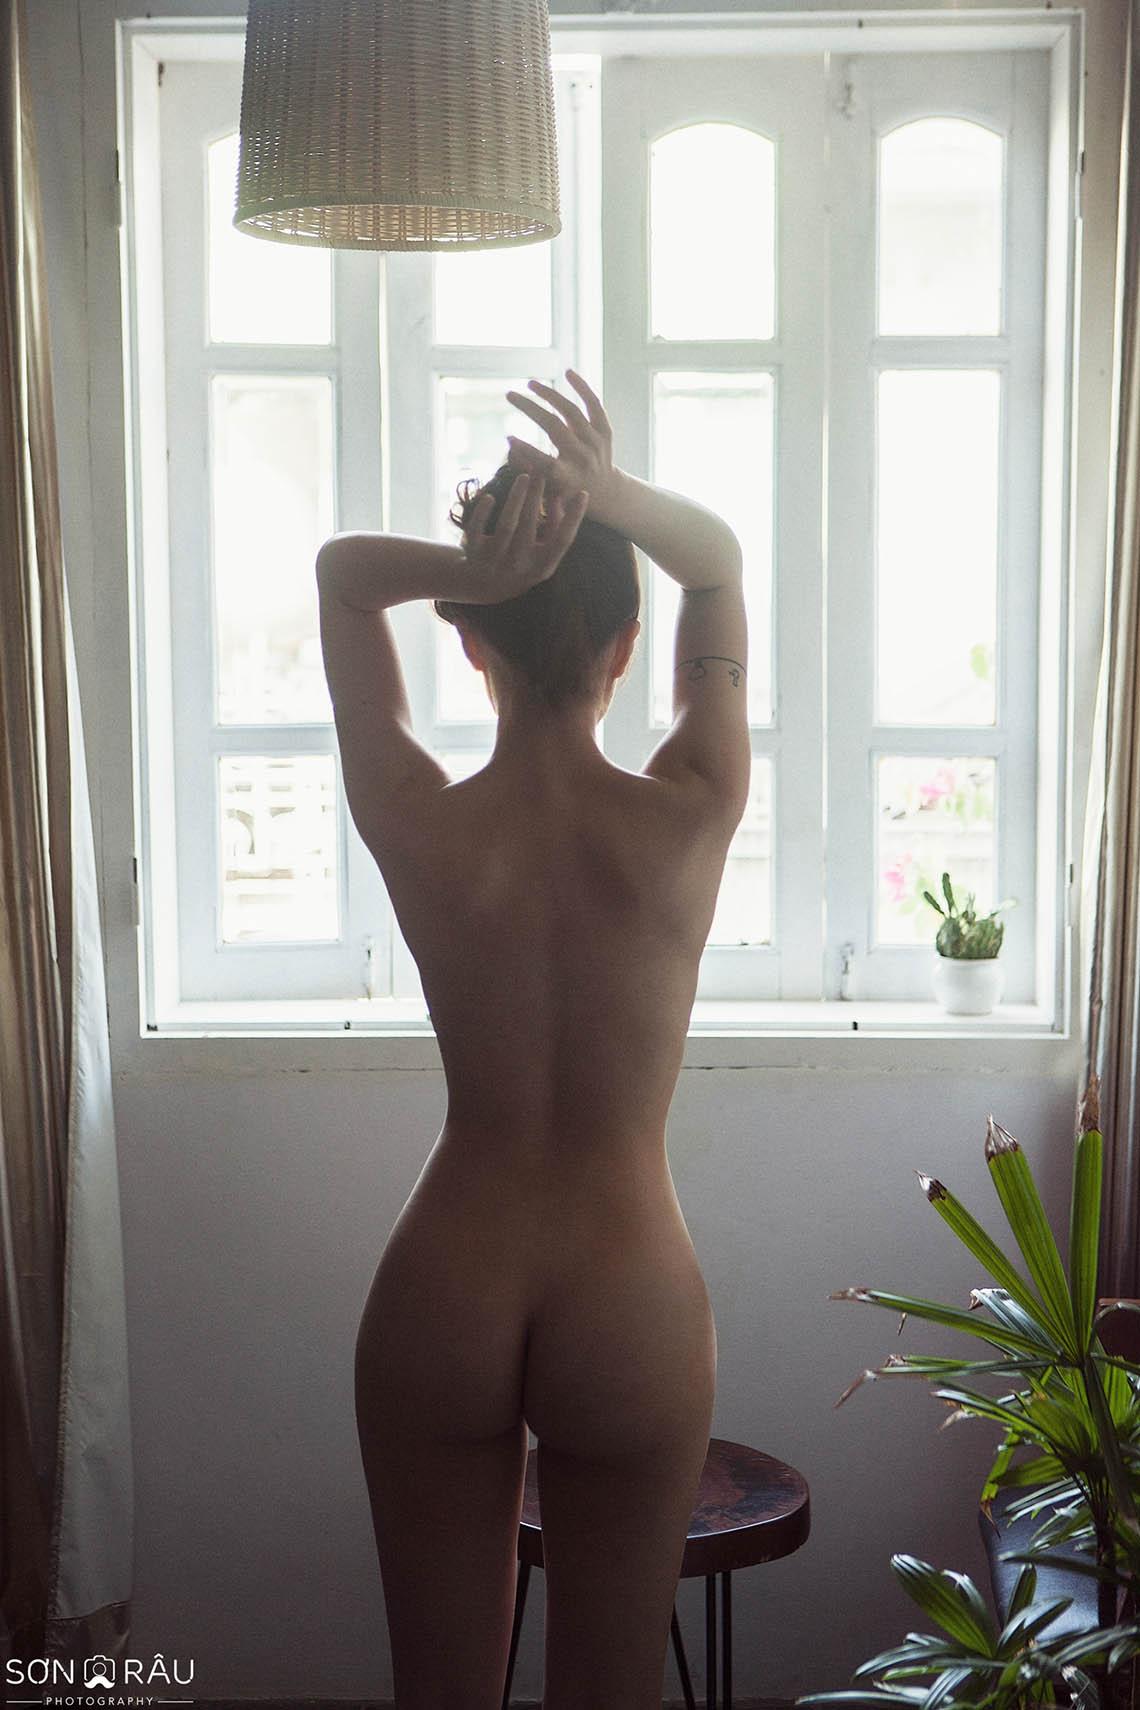 Good morning by Lucif de King